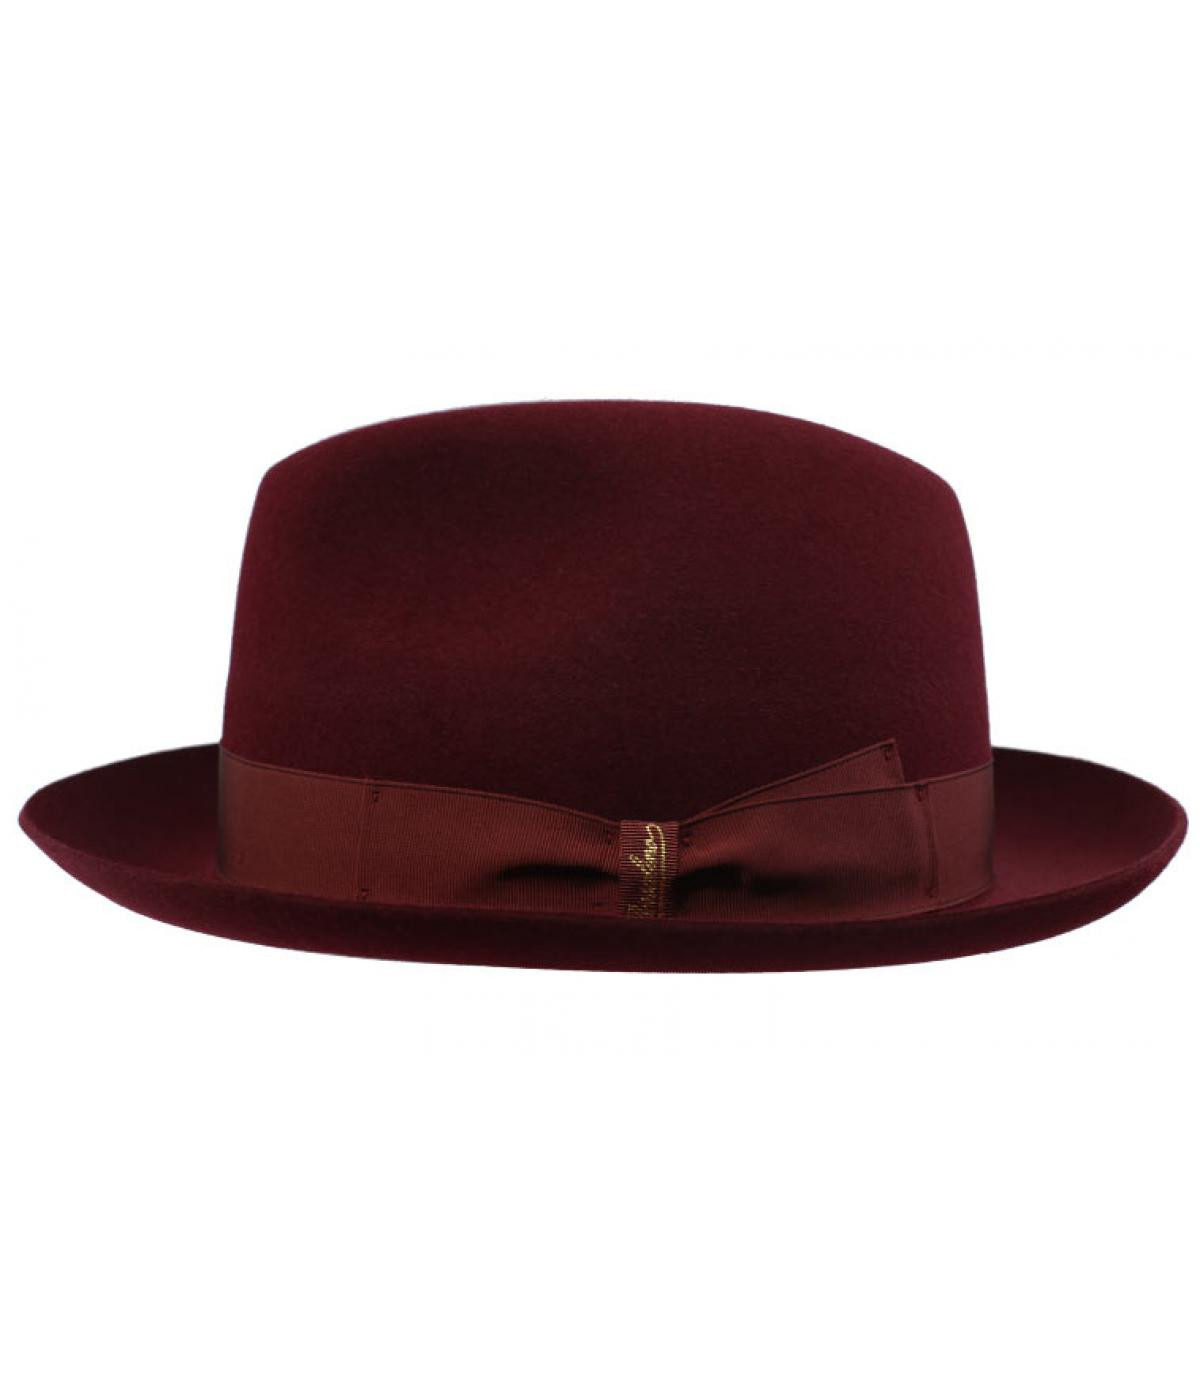 fedora rabbit burgundy Borsalino - Marengo burgundy Fur Felt Hat by ... 5fb027aae5e